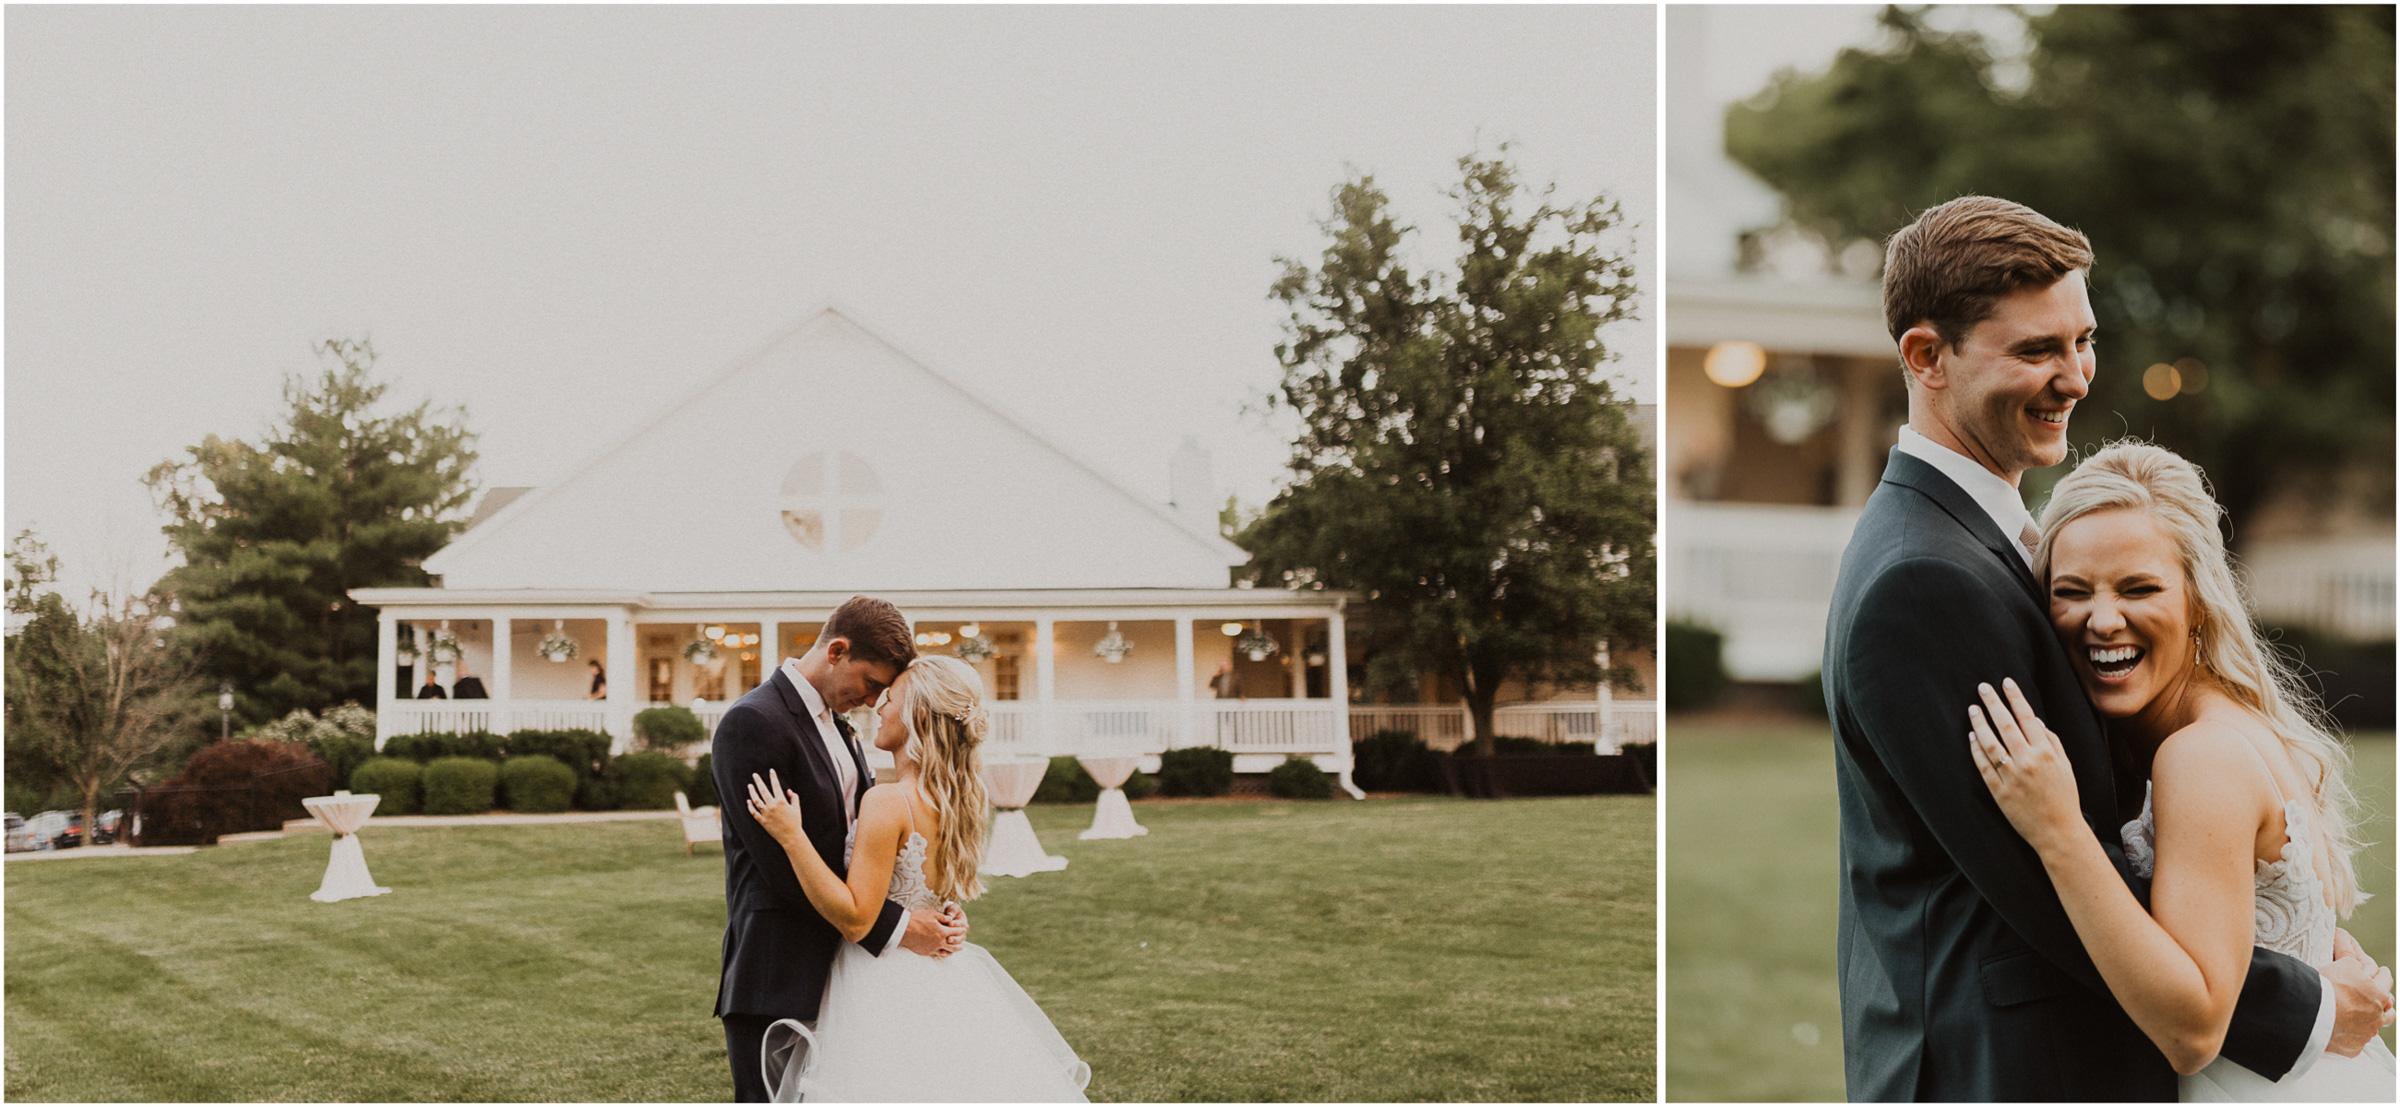 alyssa barletter photography hawthorne house summer outdoor wedding southern charm inspiration-54.jpg